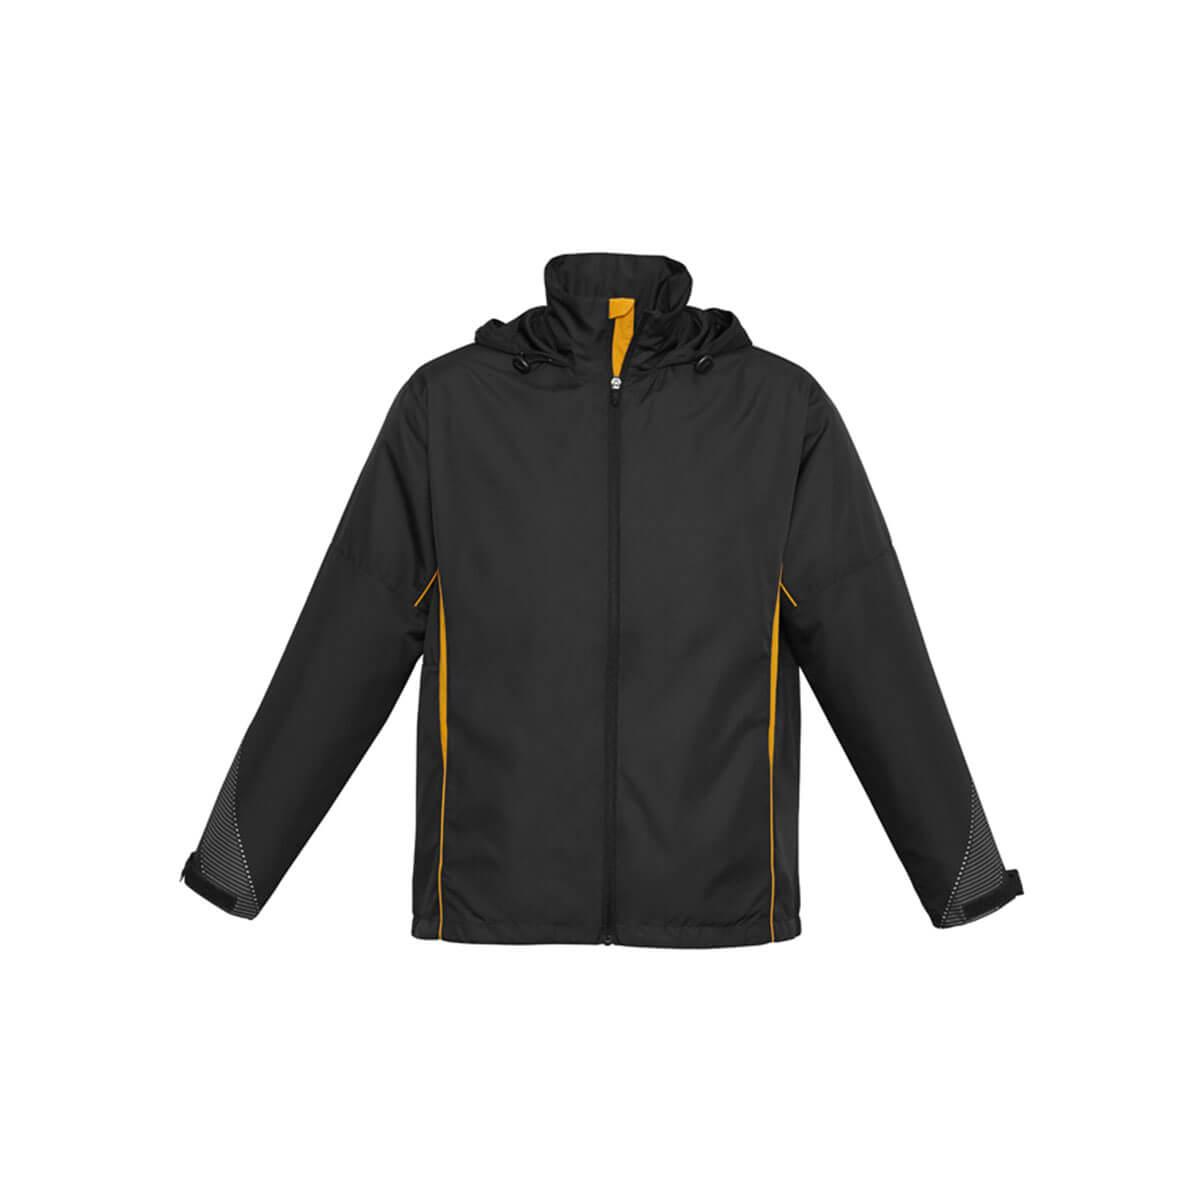 Adults Razor Team Jacket-Black / Gold